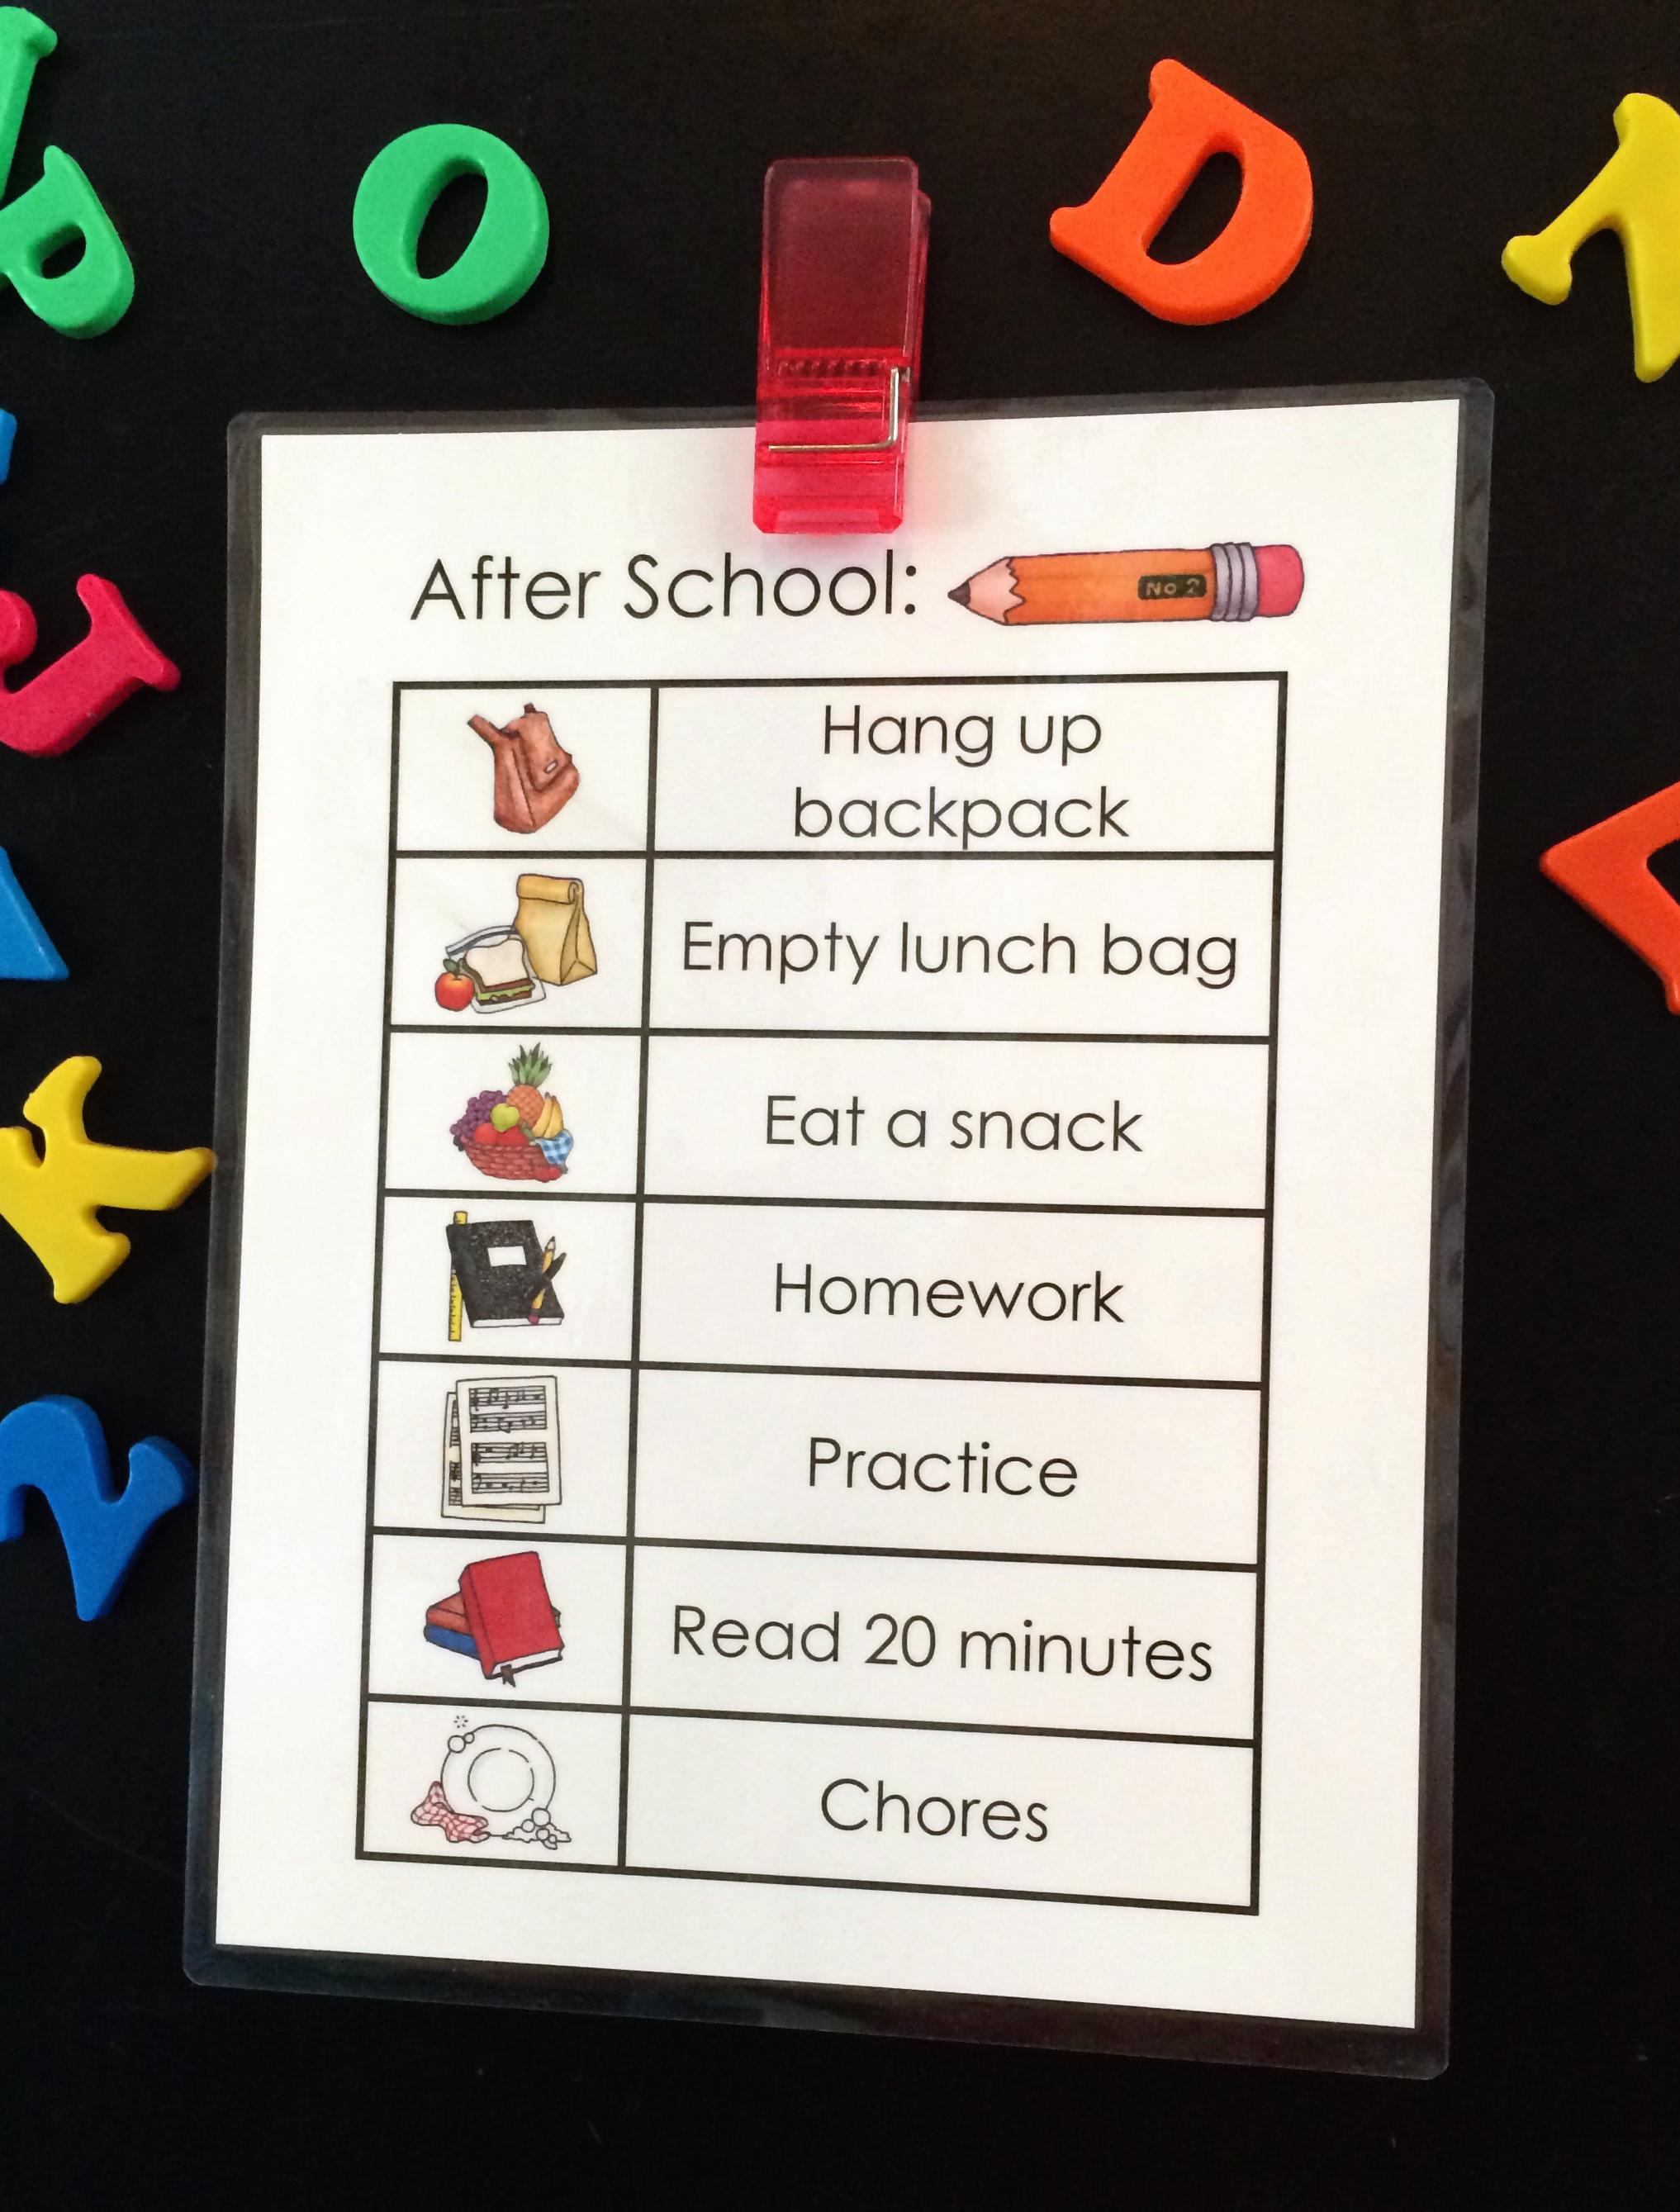 After School Job Chart Free Printable Tgif This